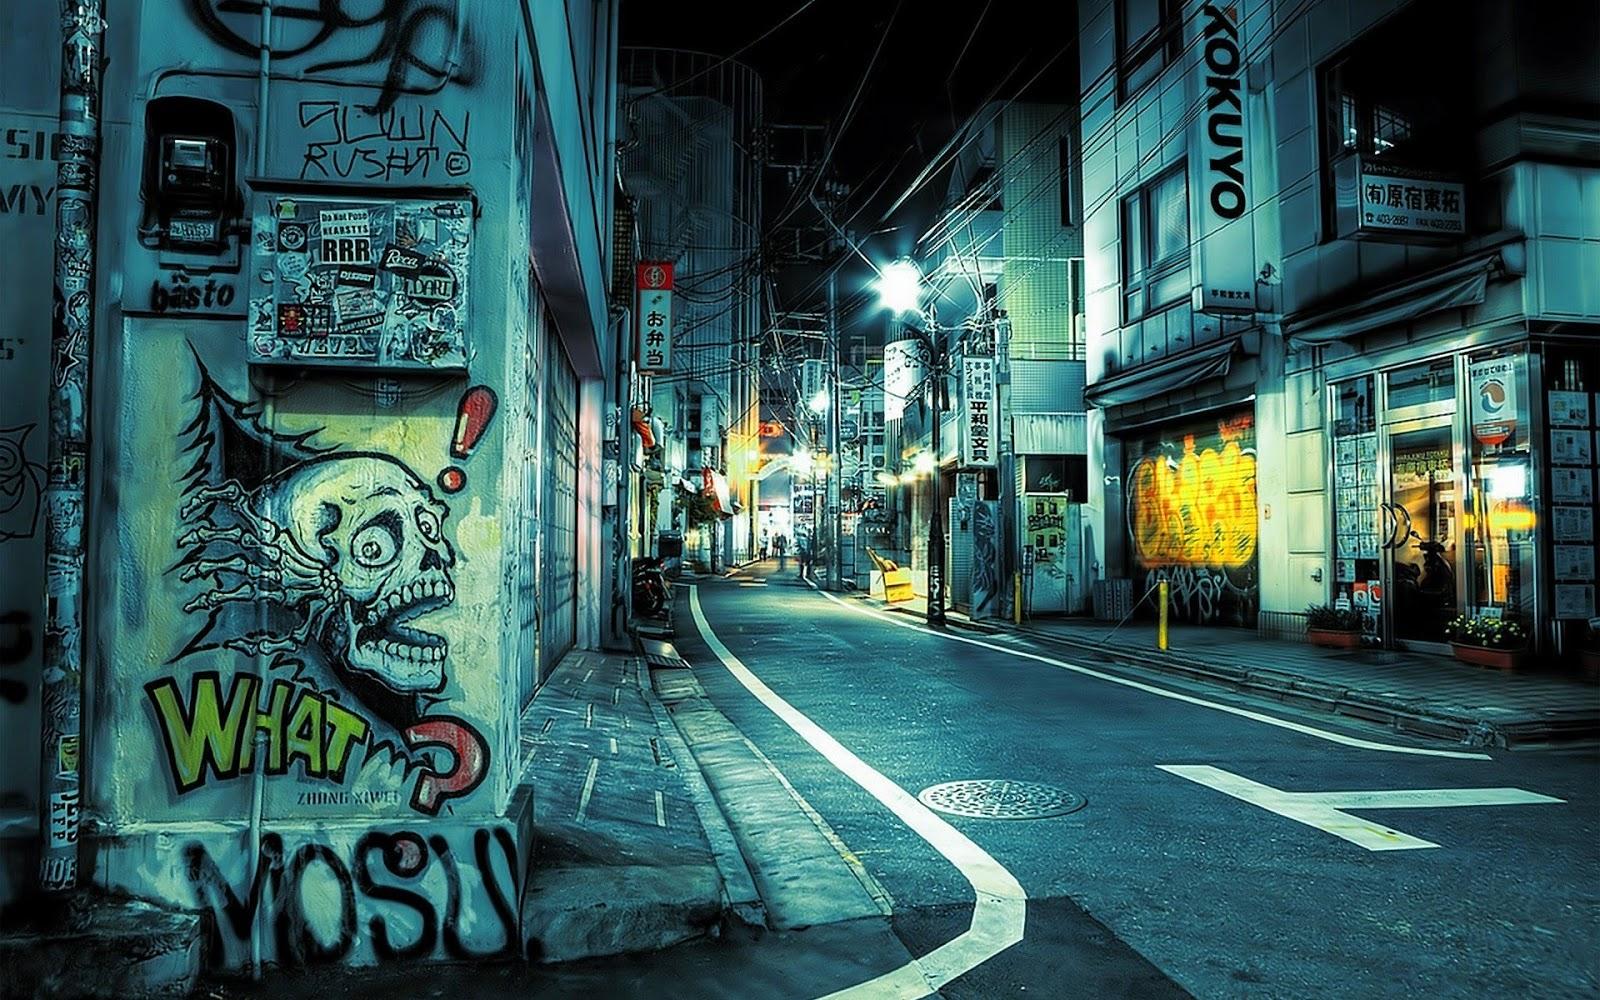 Music Graffiti Wallpapers: Graffiti Wallpaper (collection)